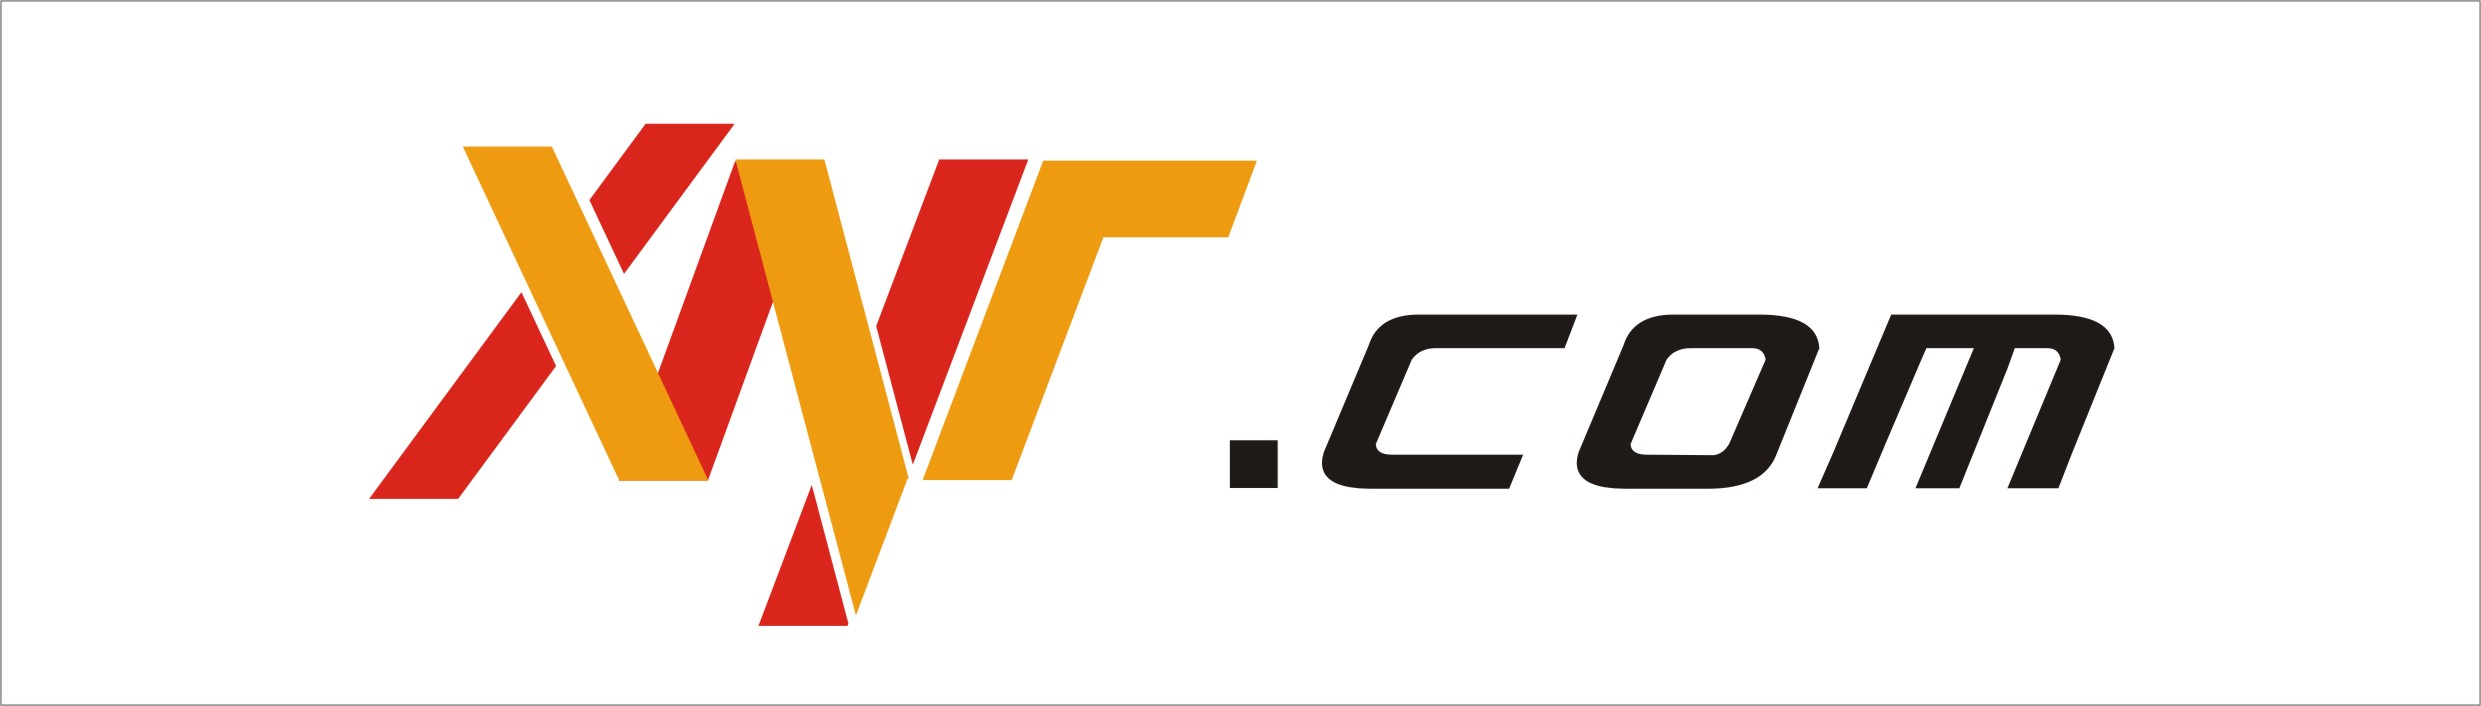 xwyr.com网站logo设计/2天